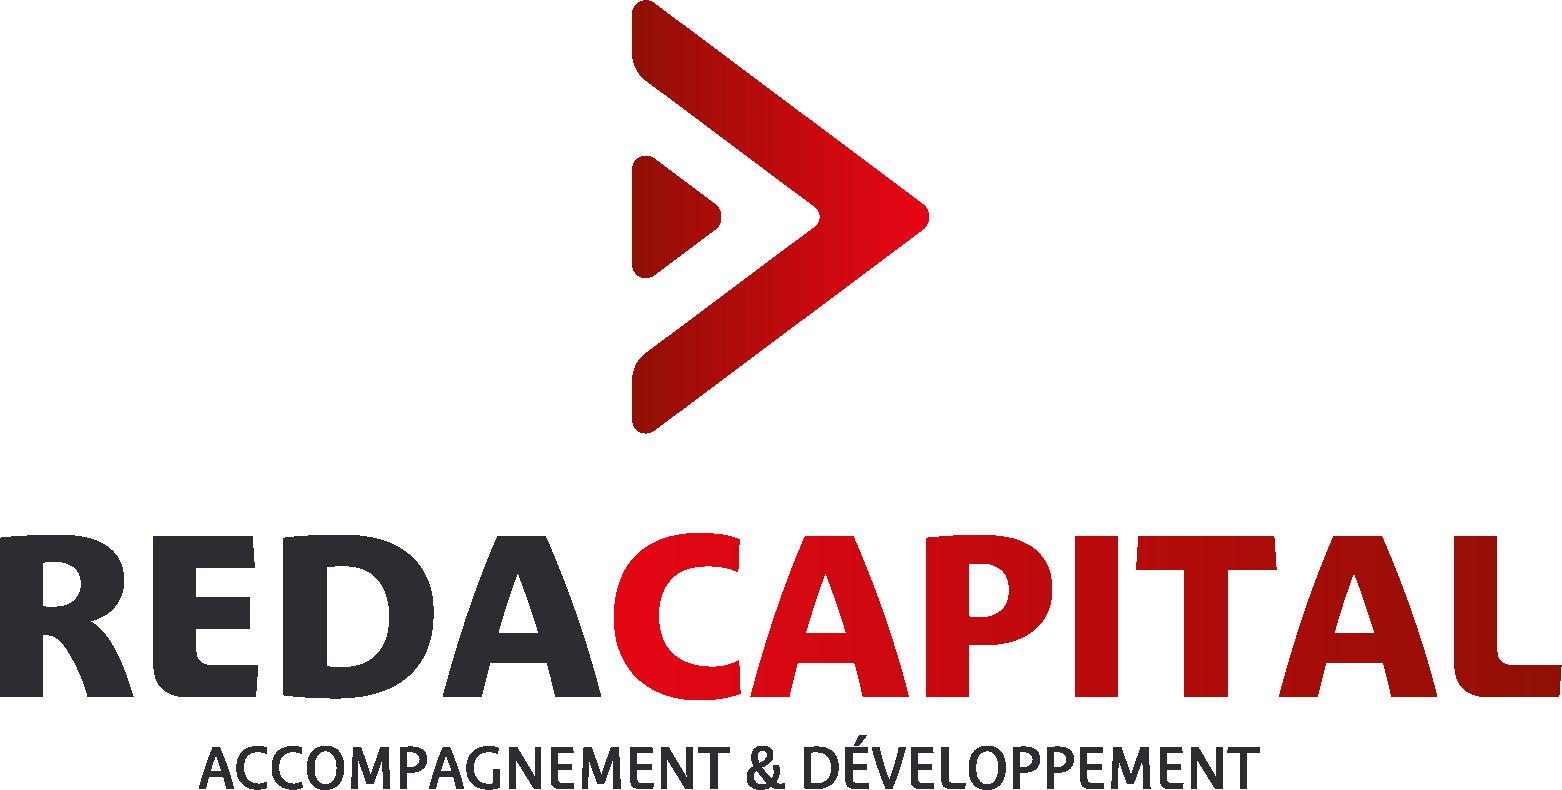 Reda Capital